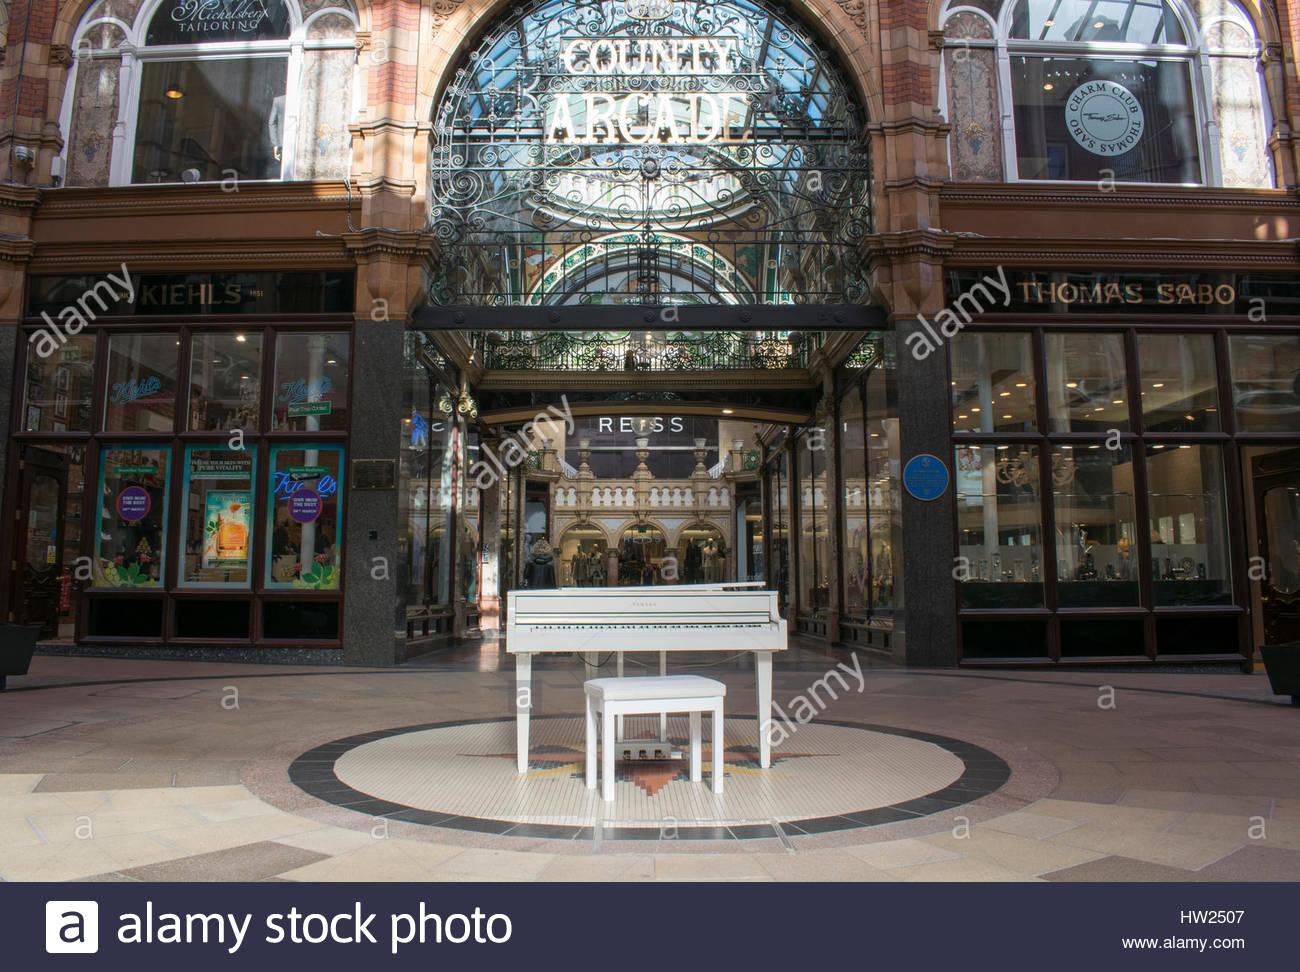 White Yamaha Baby Grand Piano, Victoria Quarter Shopping Centre, Leeds - Stock Image